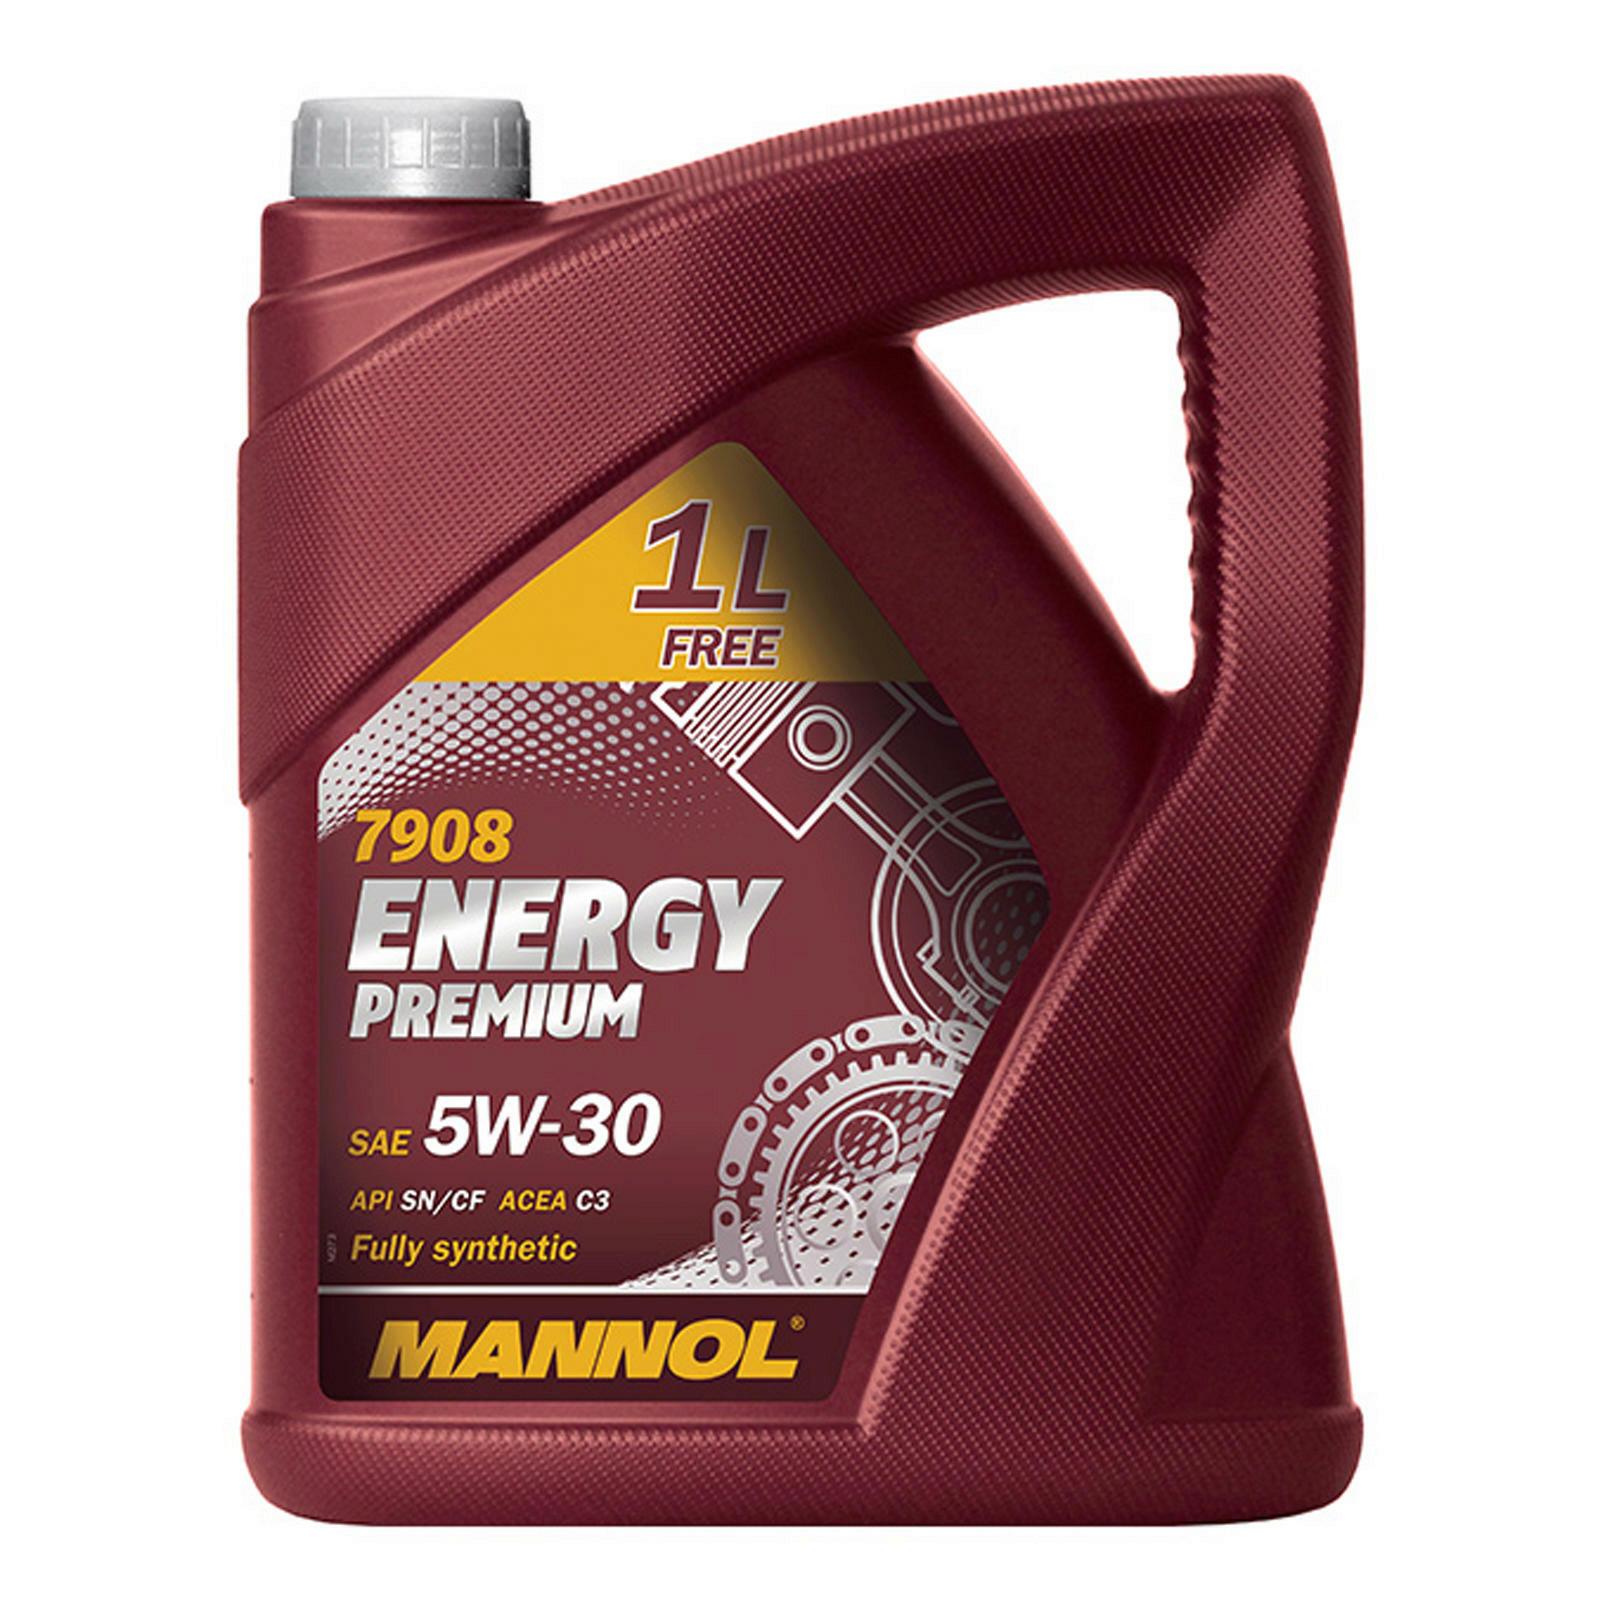 5 Liter Mannol Energy Premium 5W-30